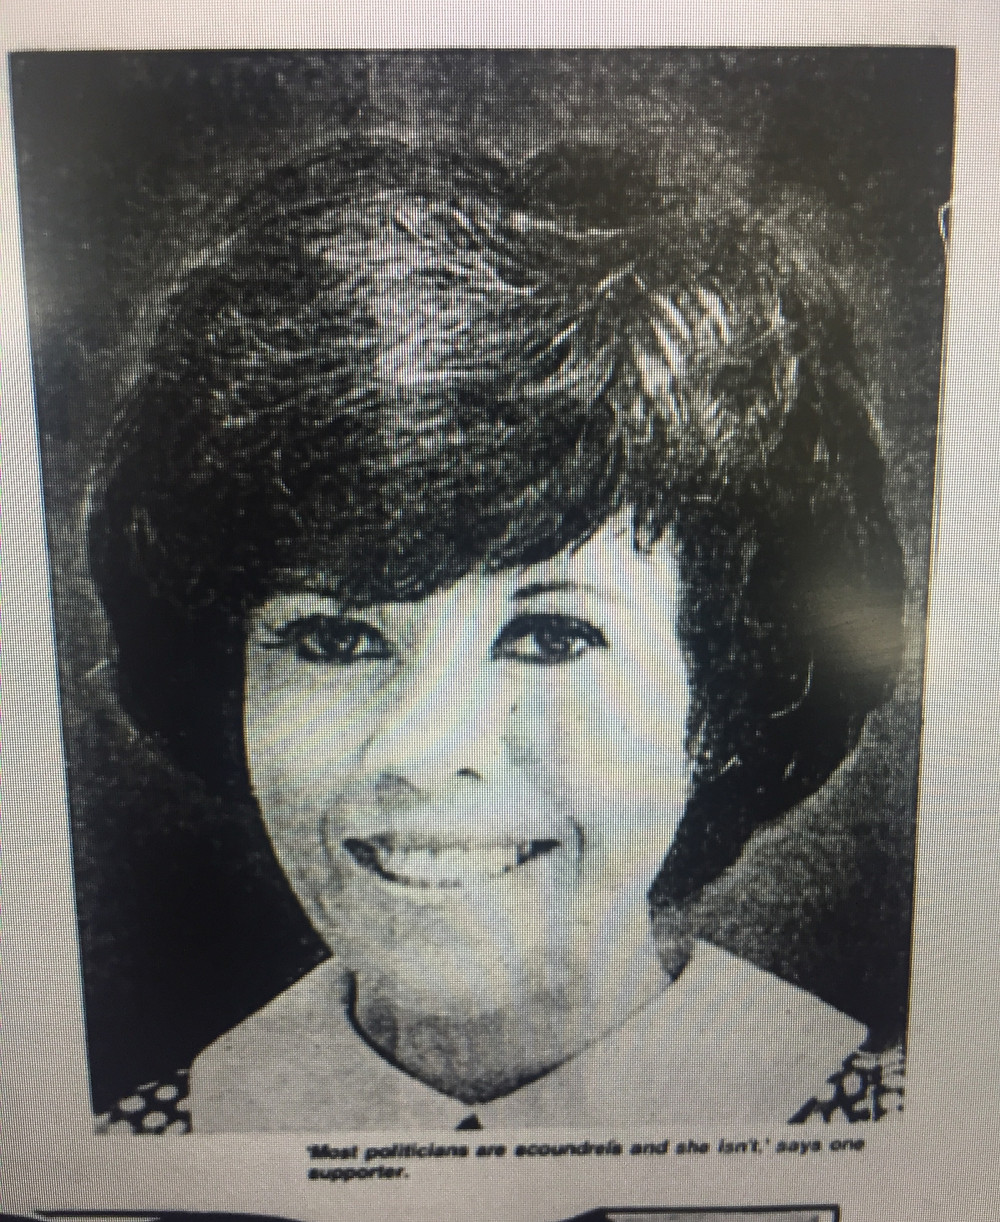 New Jersey State Senator Alene Ammond